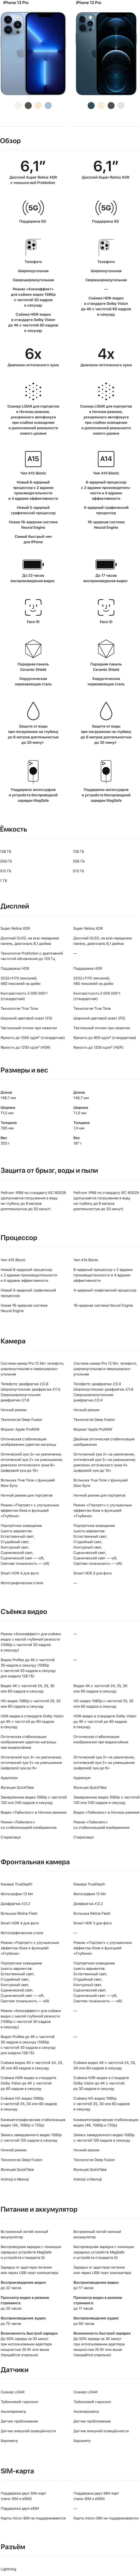 Подробное сравнение технических характеристик (спецификаций) iPhone 13 Pro и iPhone 12 Pro